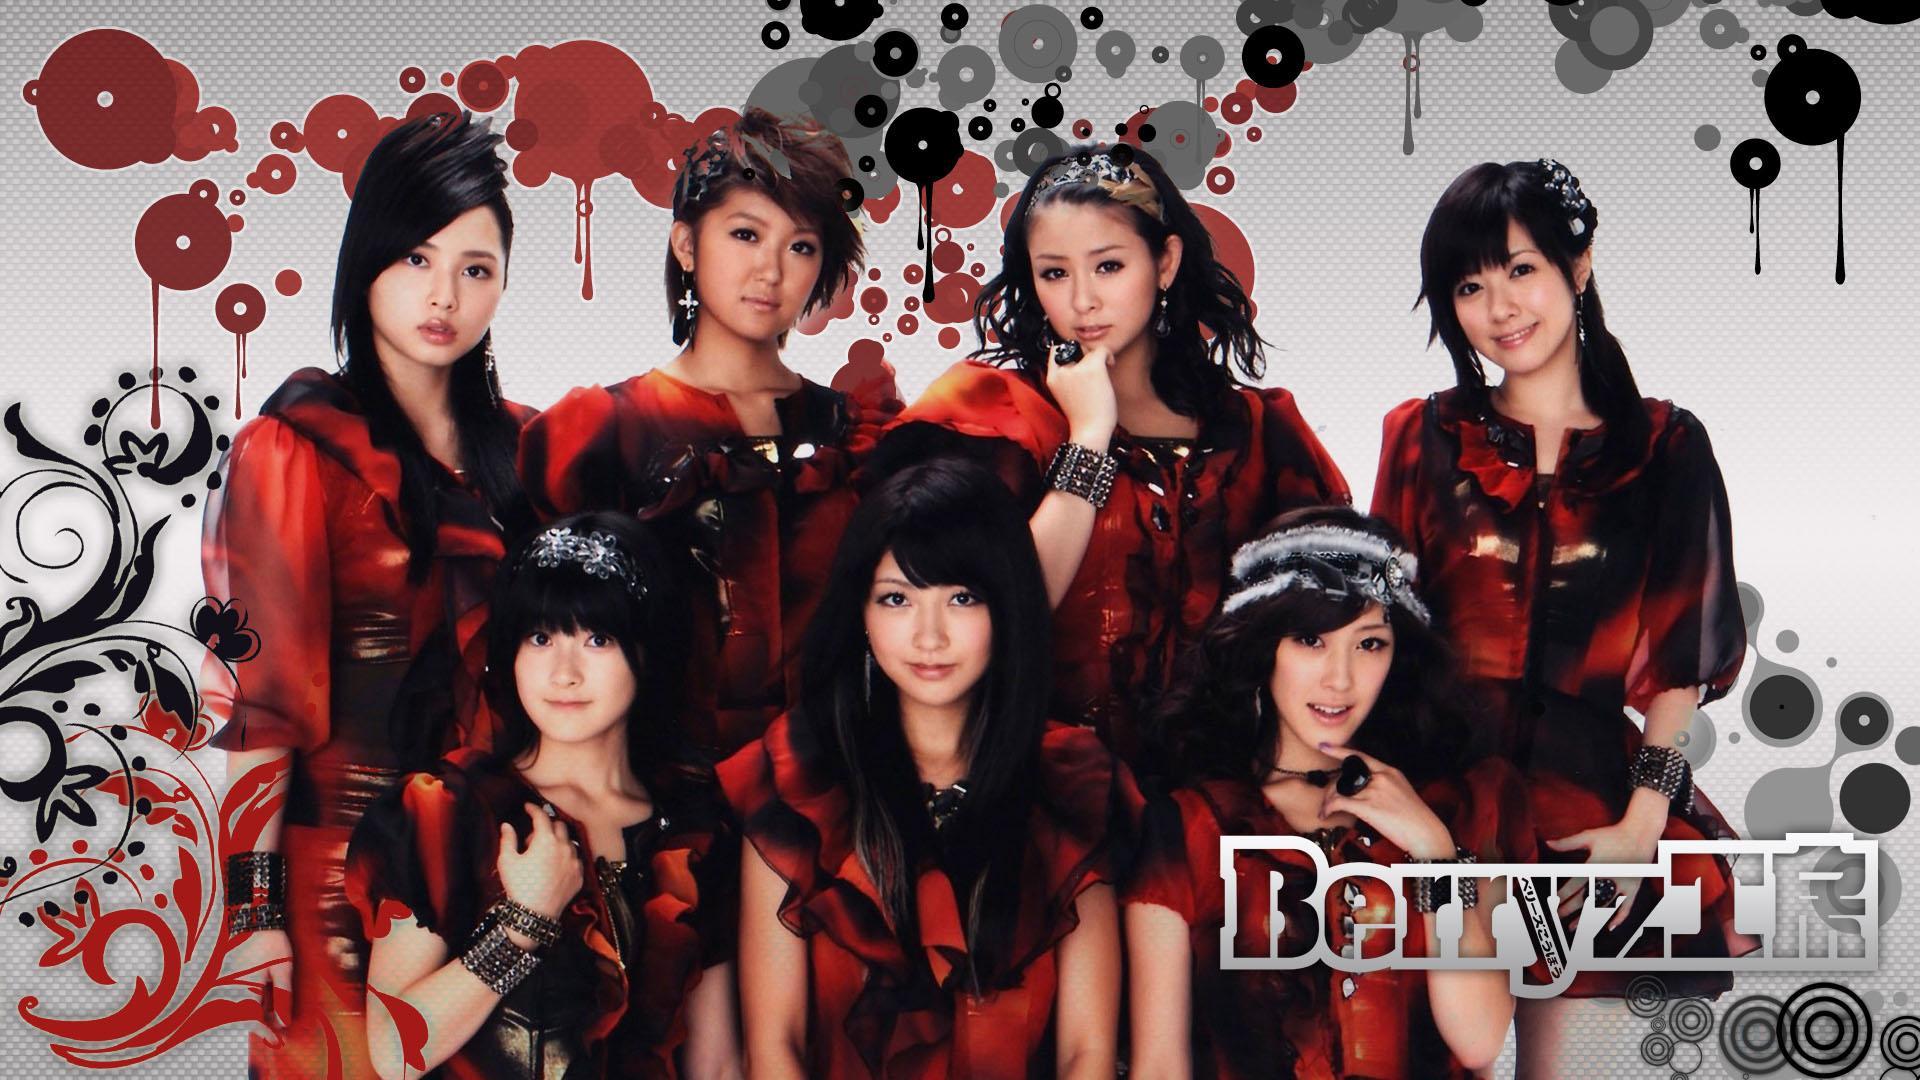 Berryz - Shining Power